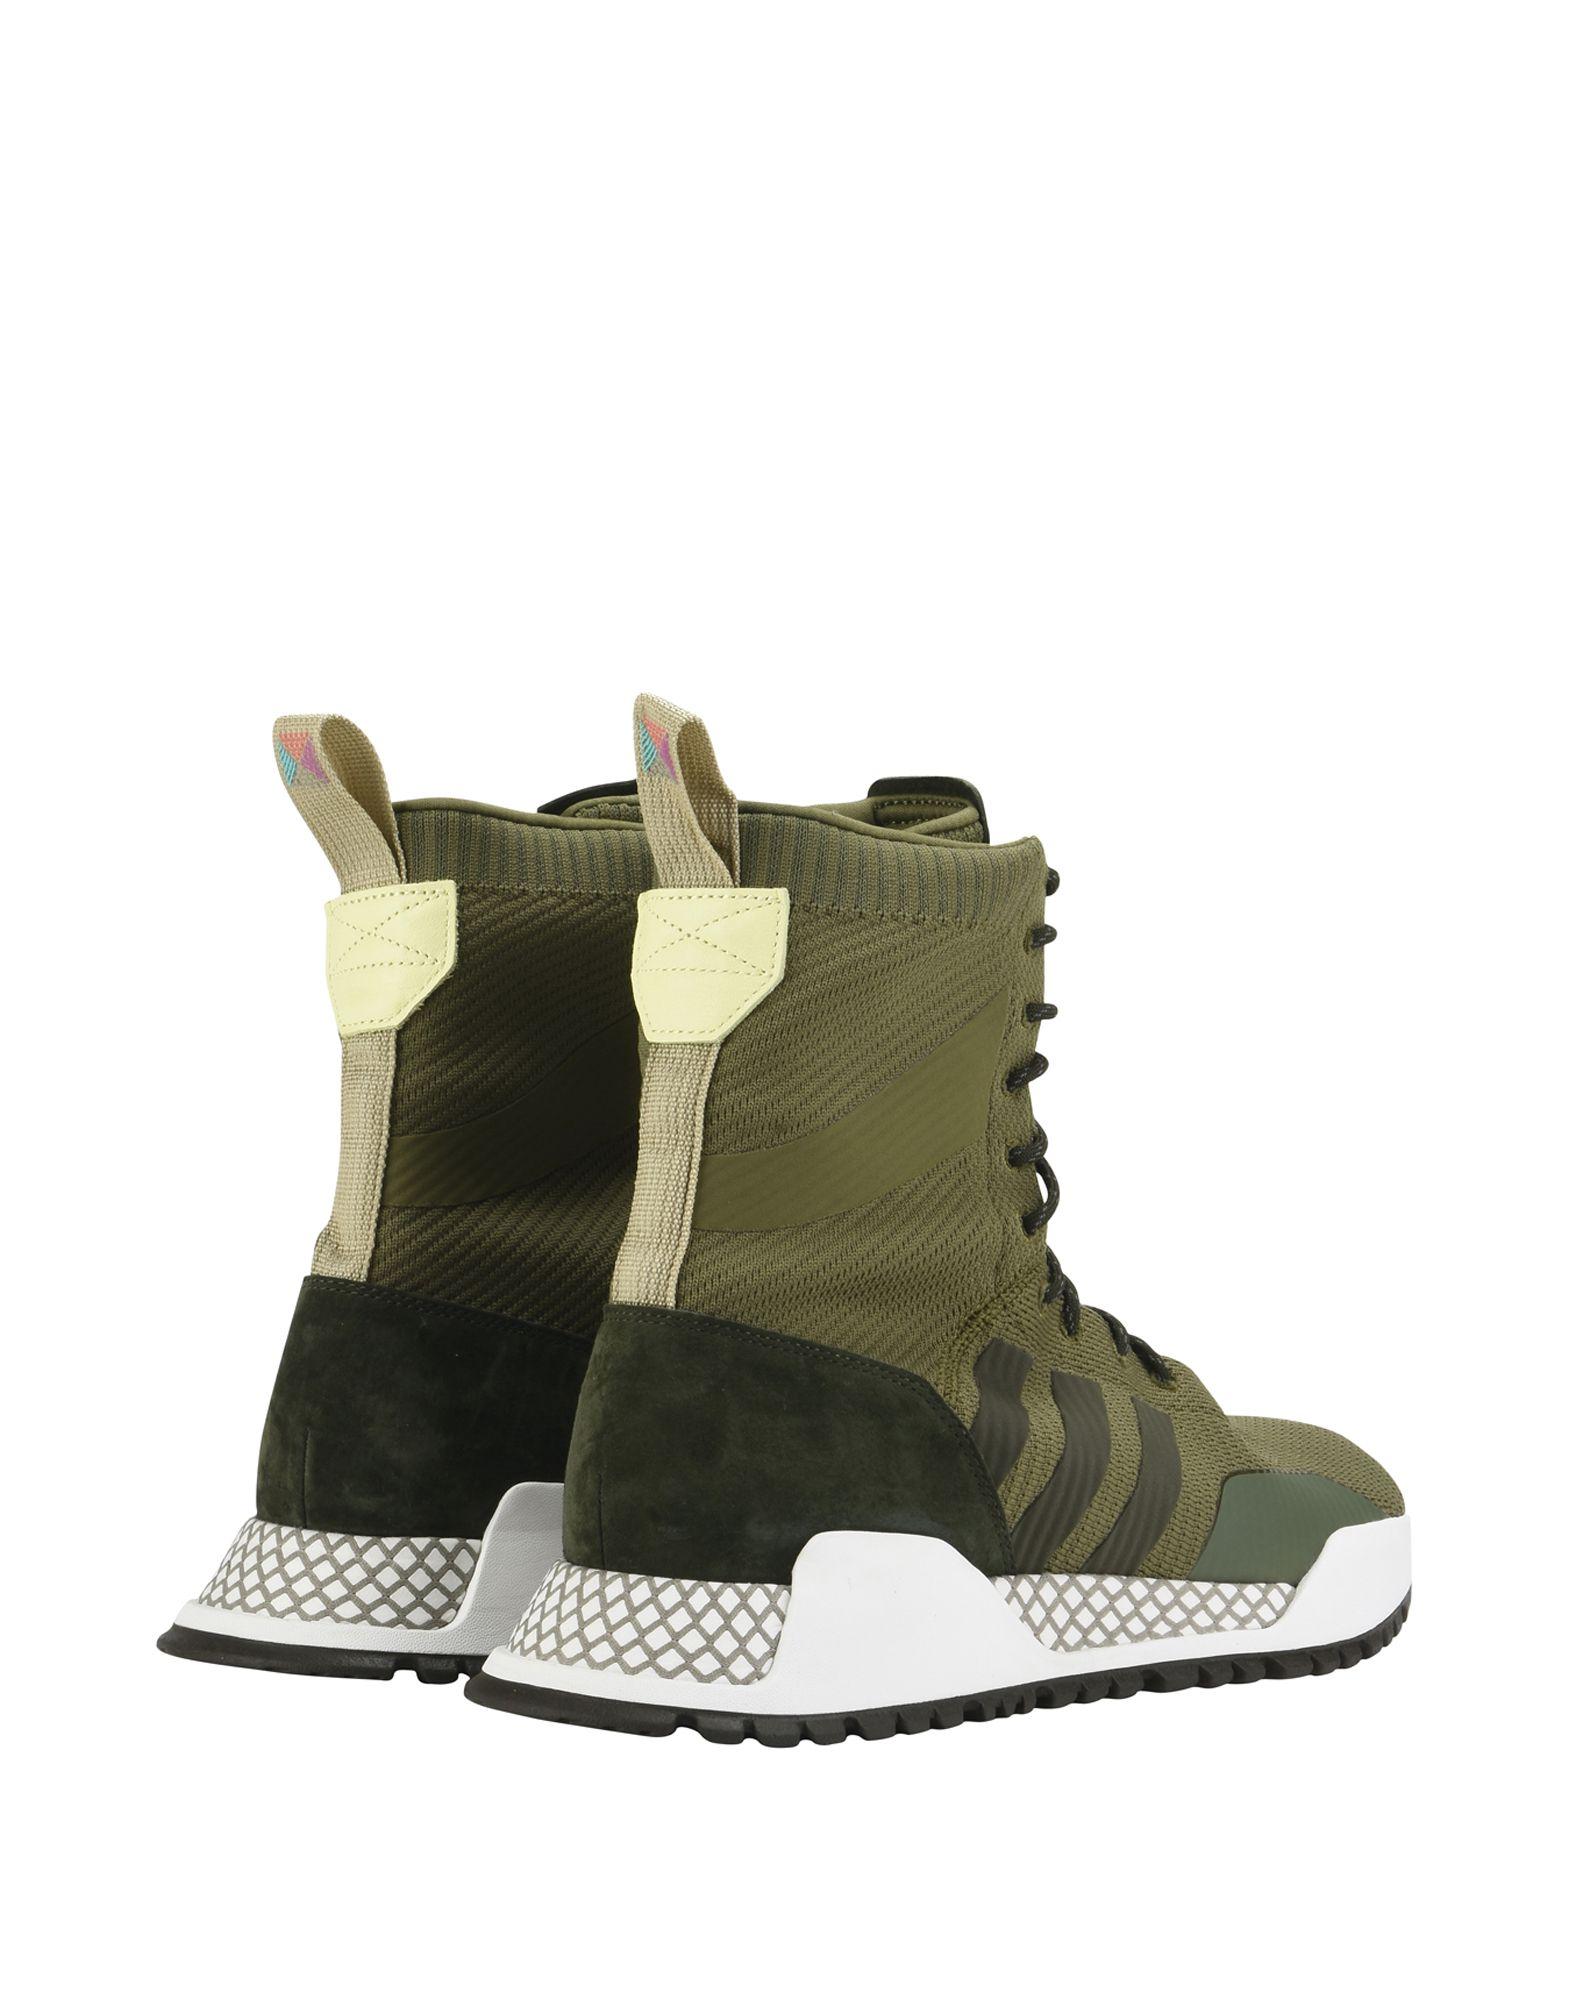 Rabatt F/1.3 echte Schuhe Adidas Originals F/1.3 Rabatt Pk  11435395RK 6270e6